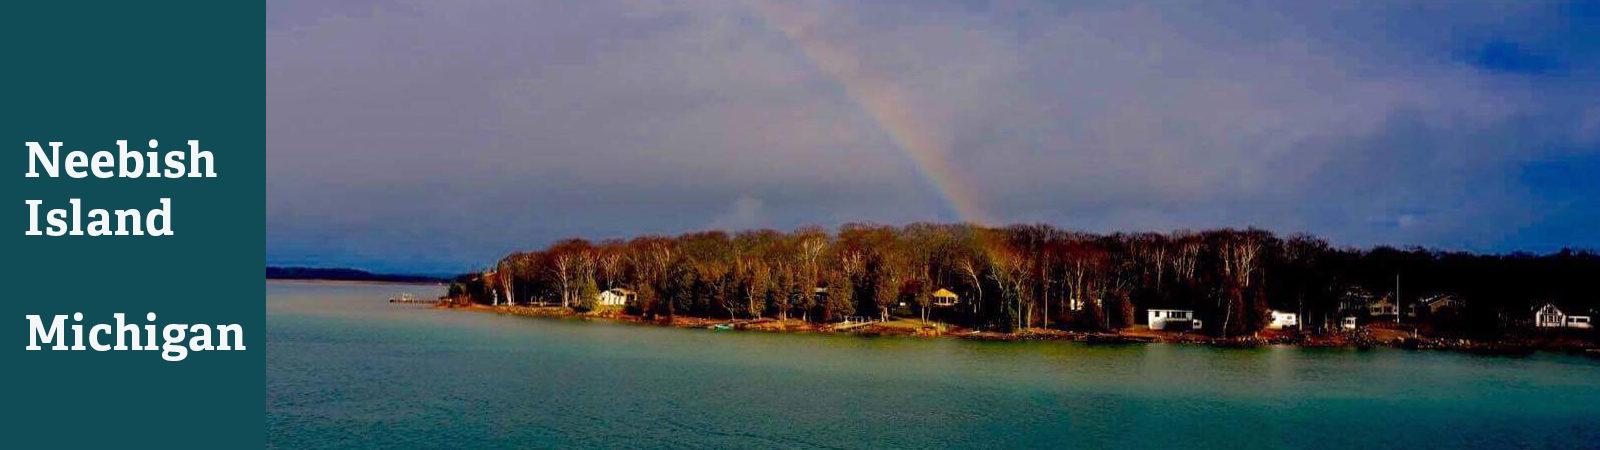 eca198432 Neebish Island, Michigan - Northland College